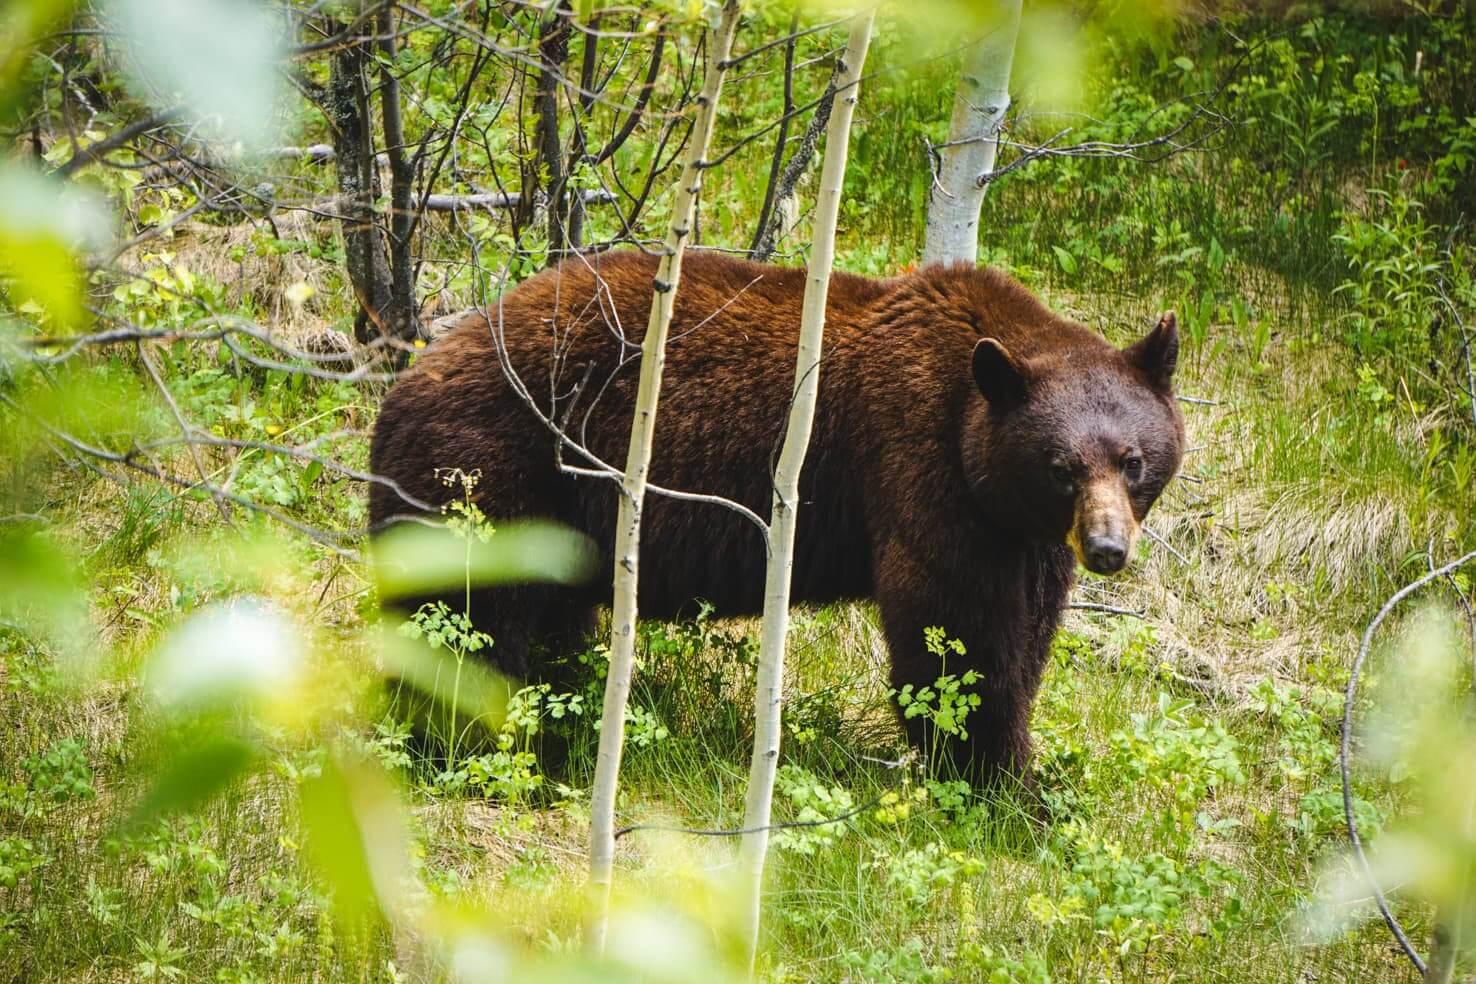 Canadian Rockies road trip itinerary - Cinnamon Bear in Jasper National Park